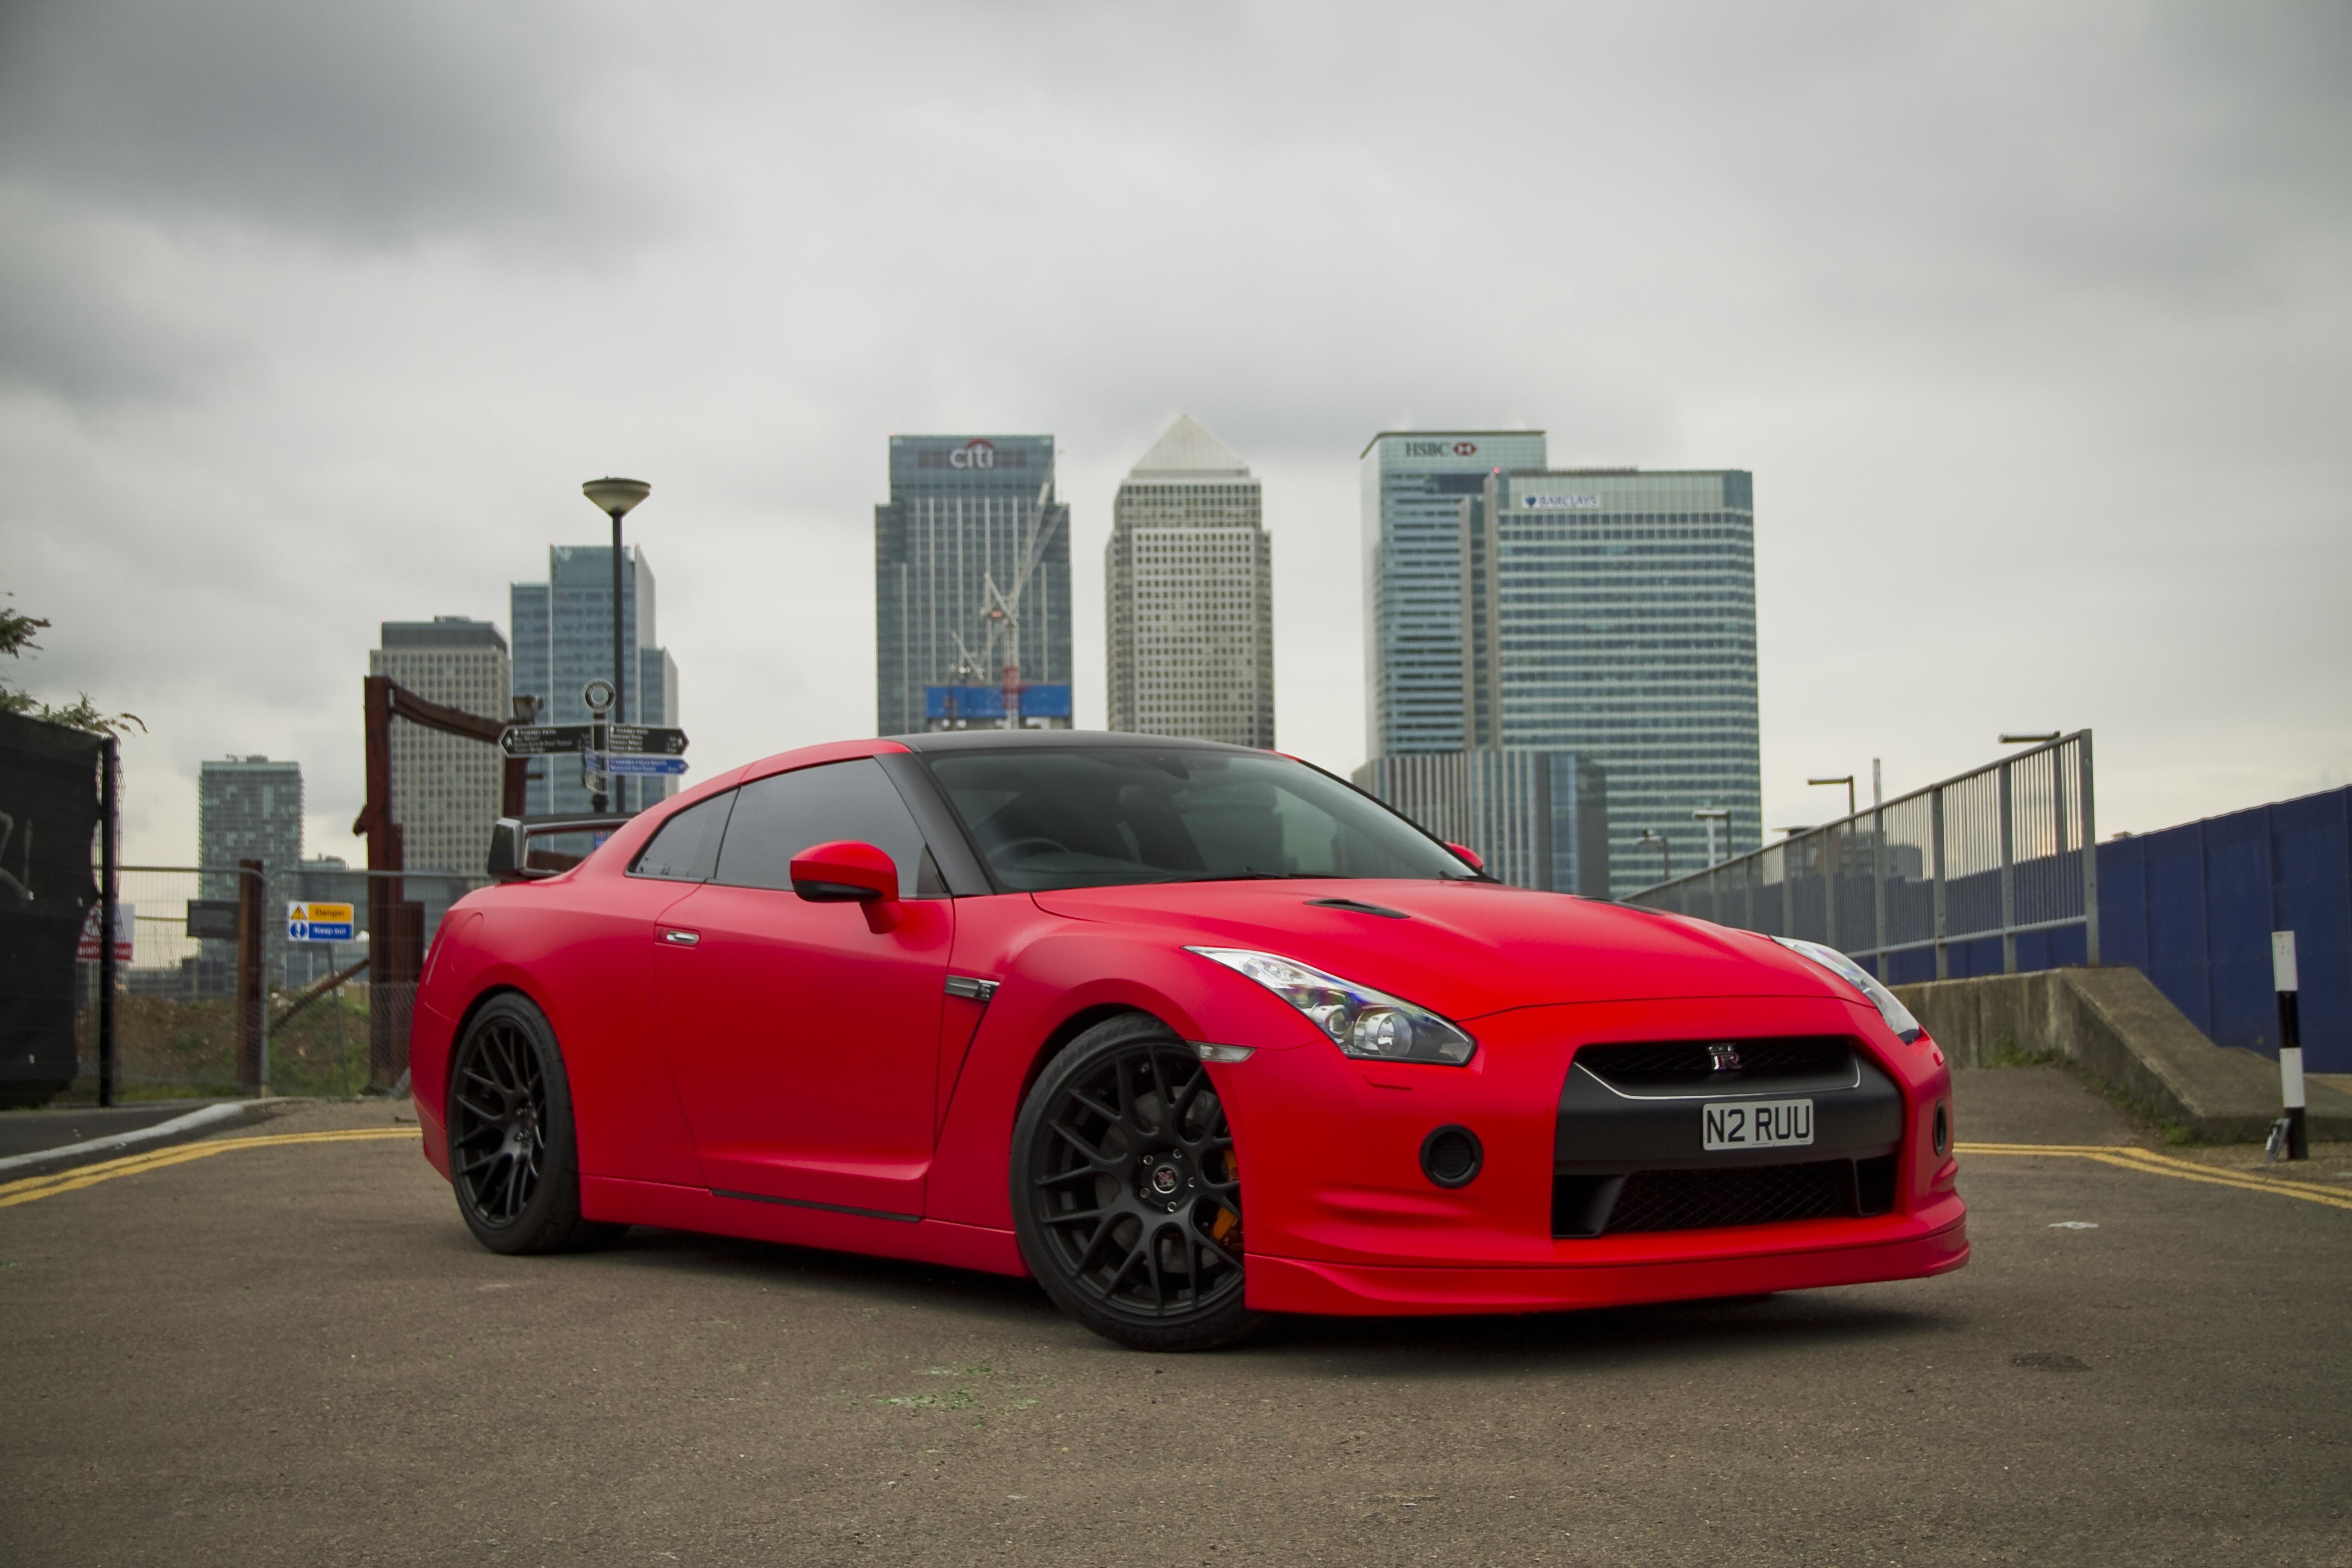 Nissan gtr r35 Red Cars wallpaper | 5184x3456 | 1097002 ...